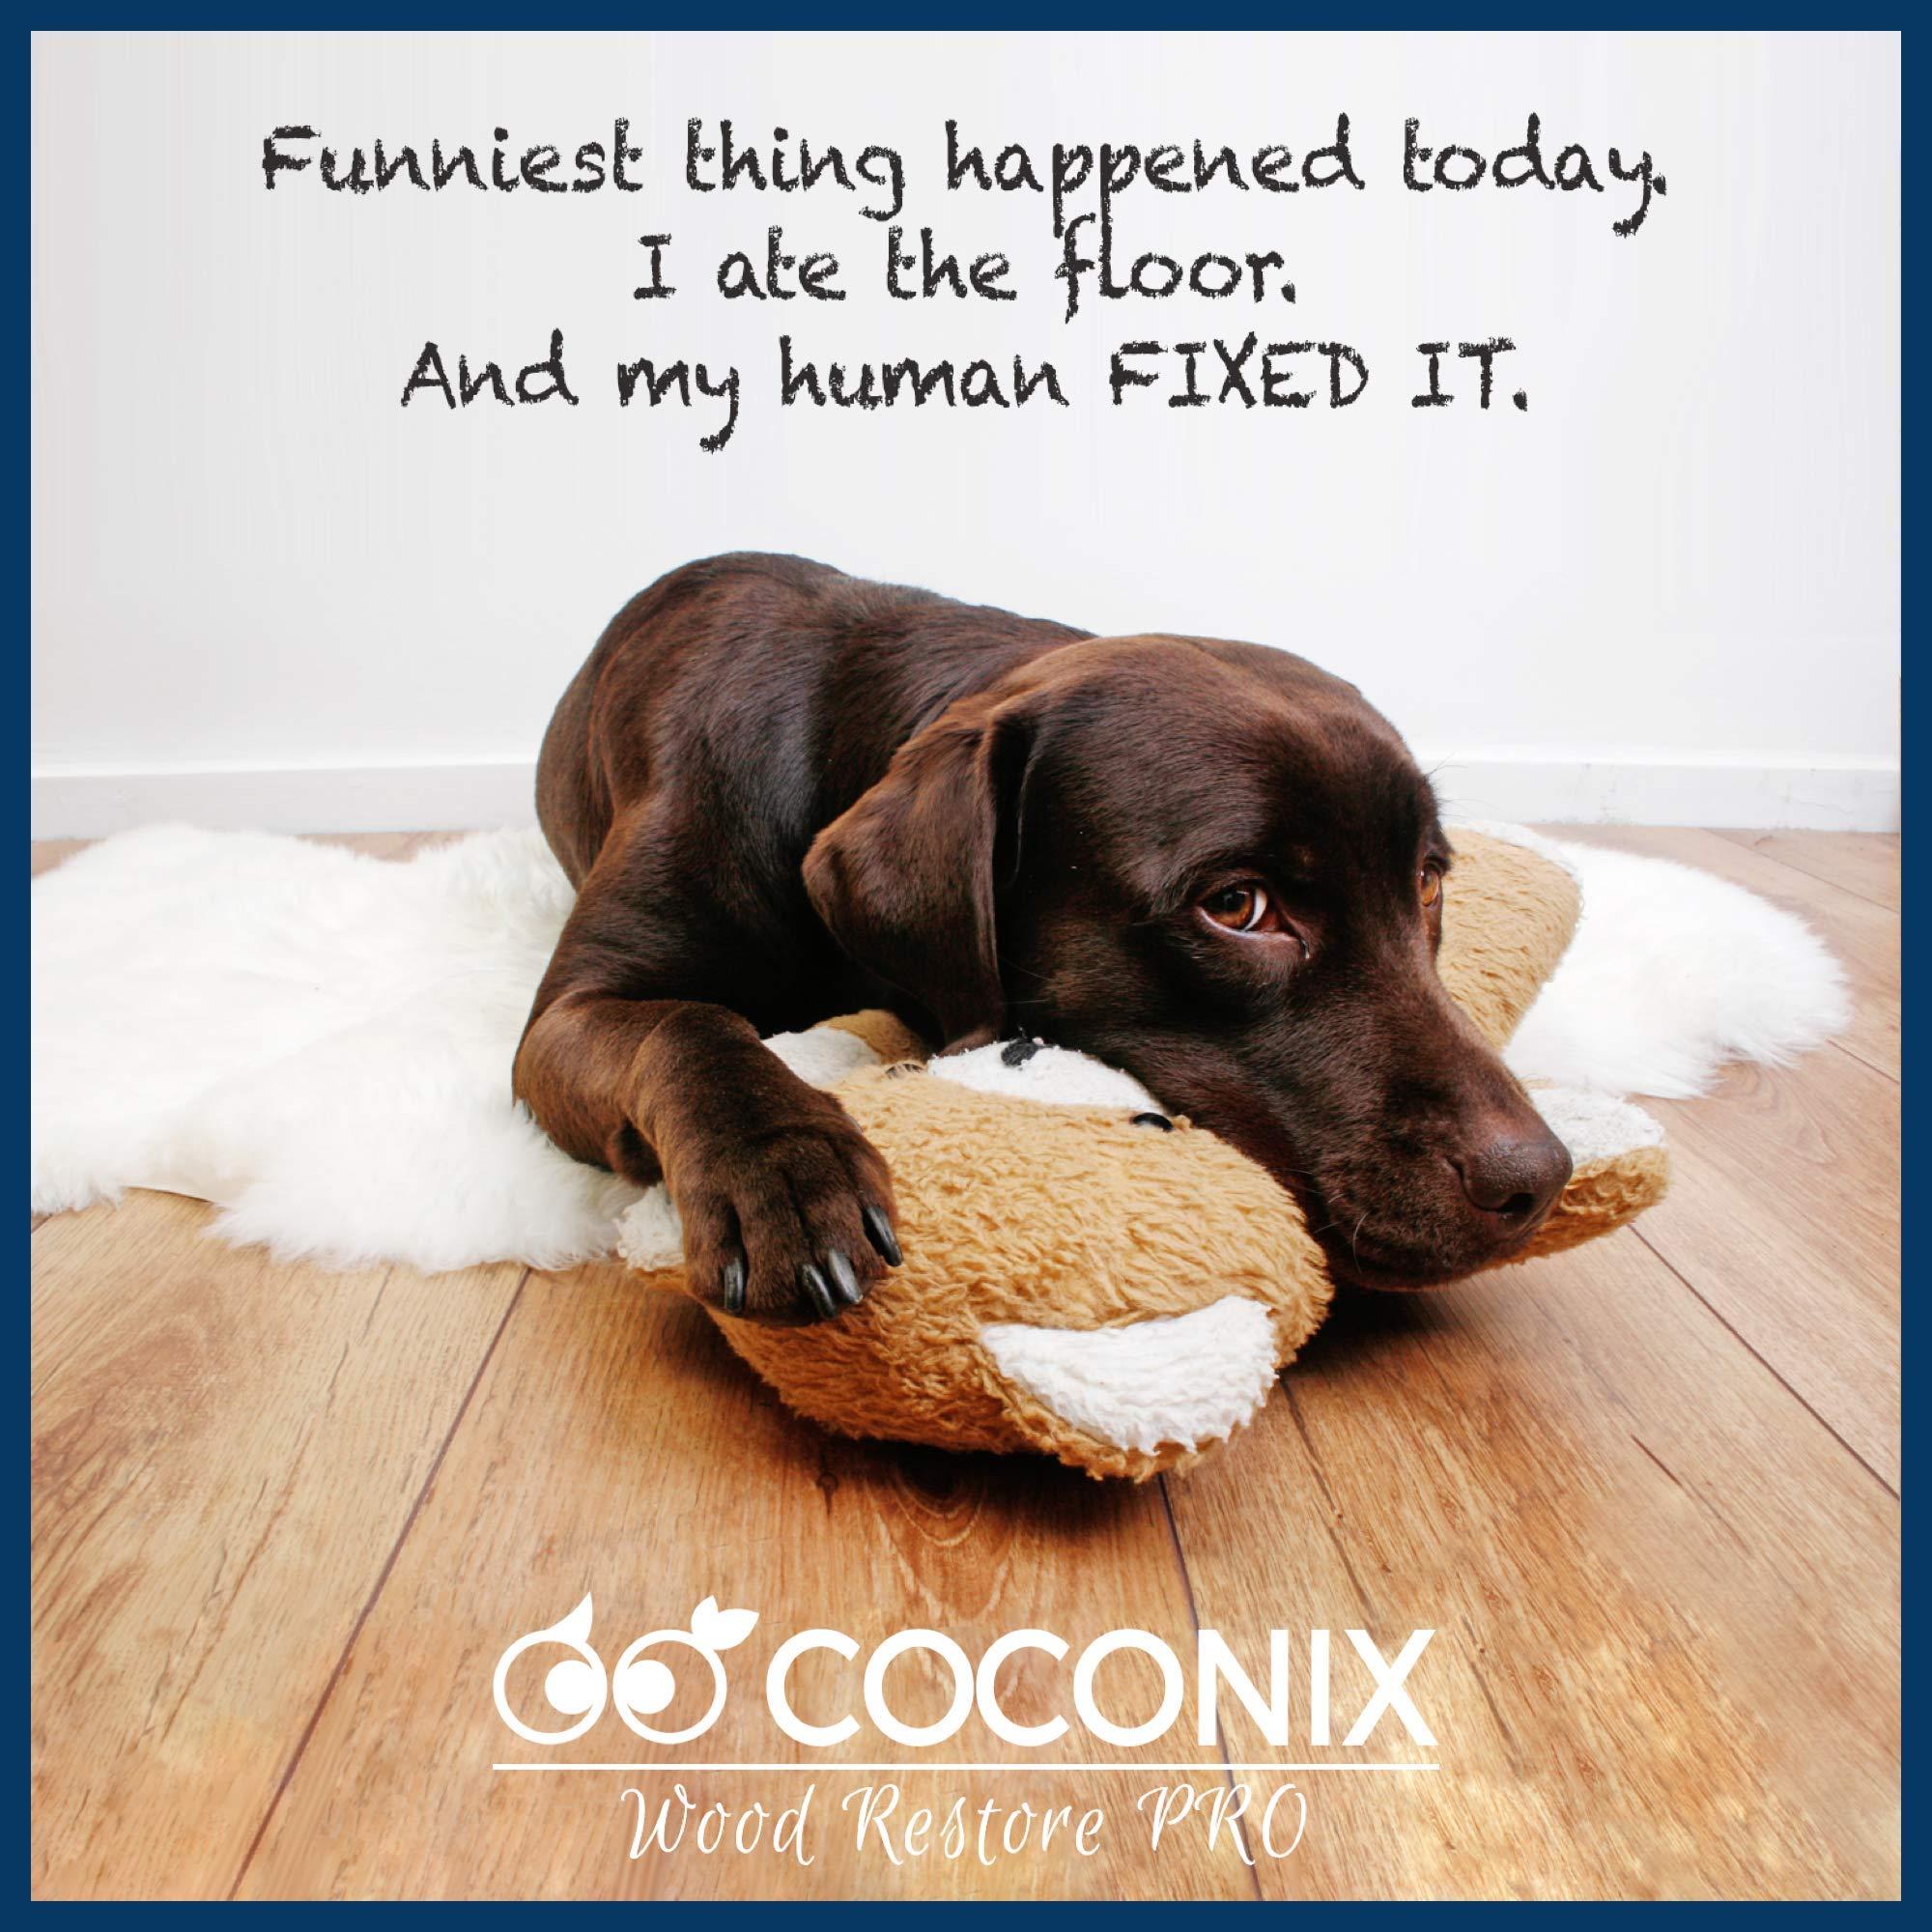 Coconix Wood Restore PRO - Professional Floor & Furniture Repair Kit by Coconix (Image #7)